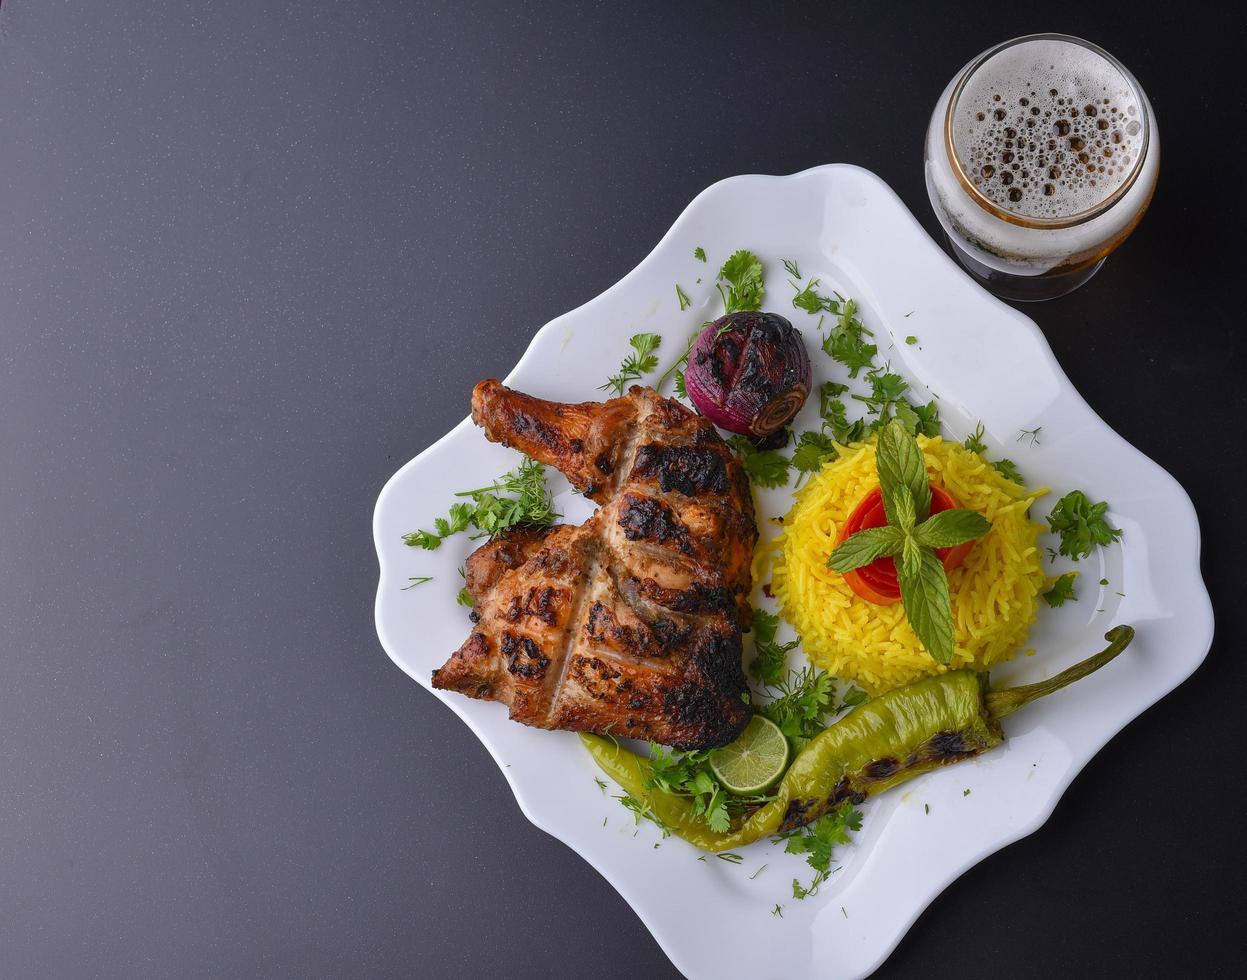 Grilled chicken breast lunch photo